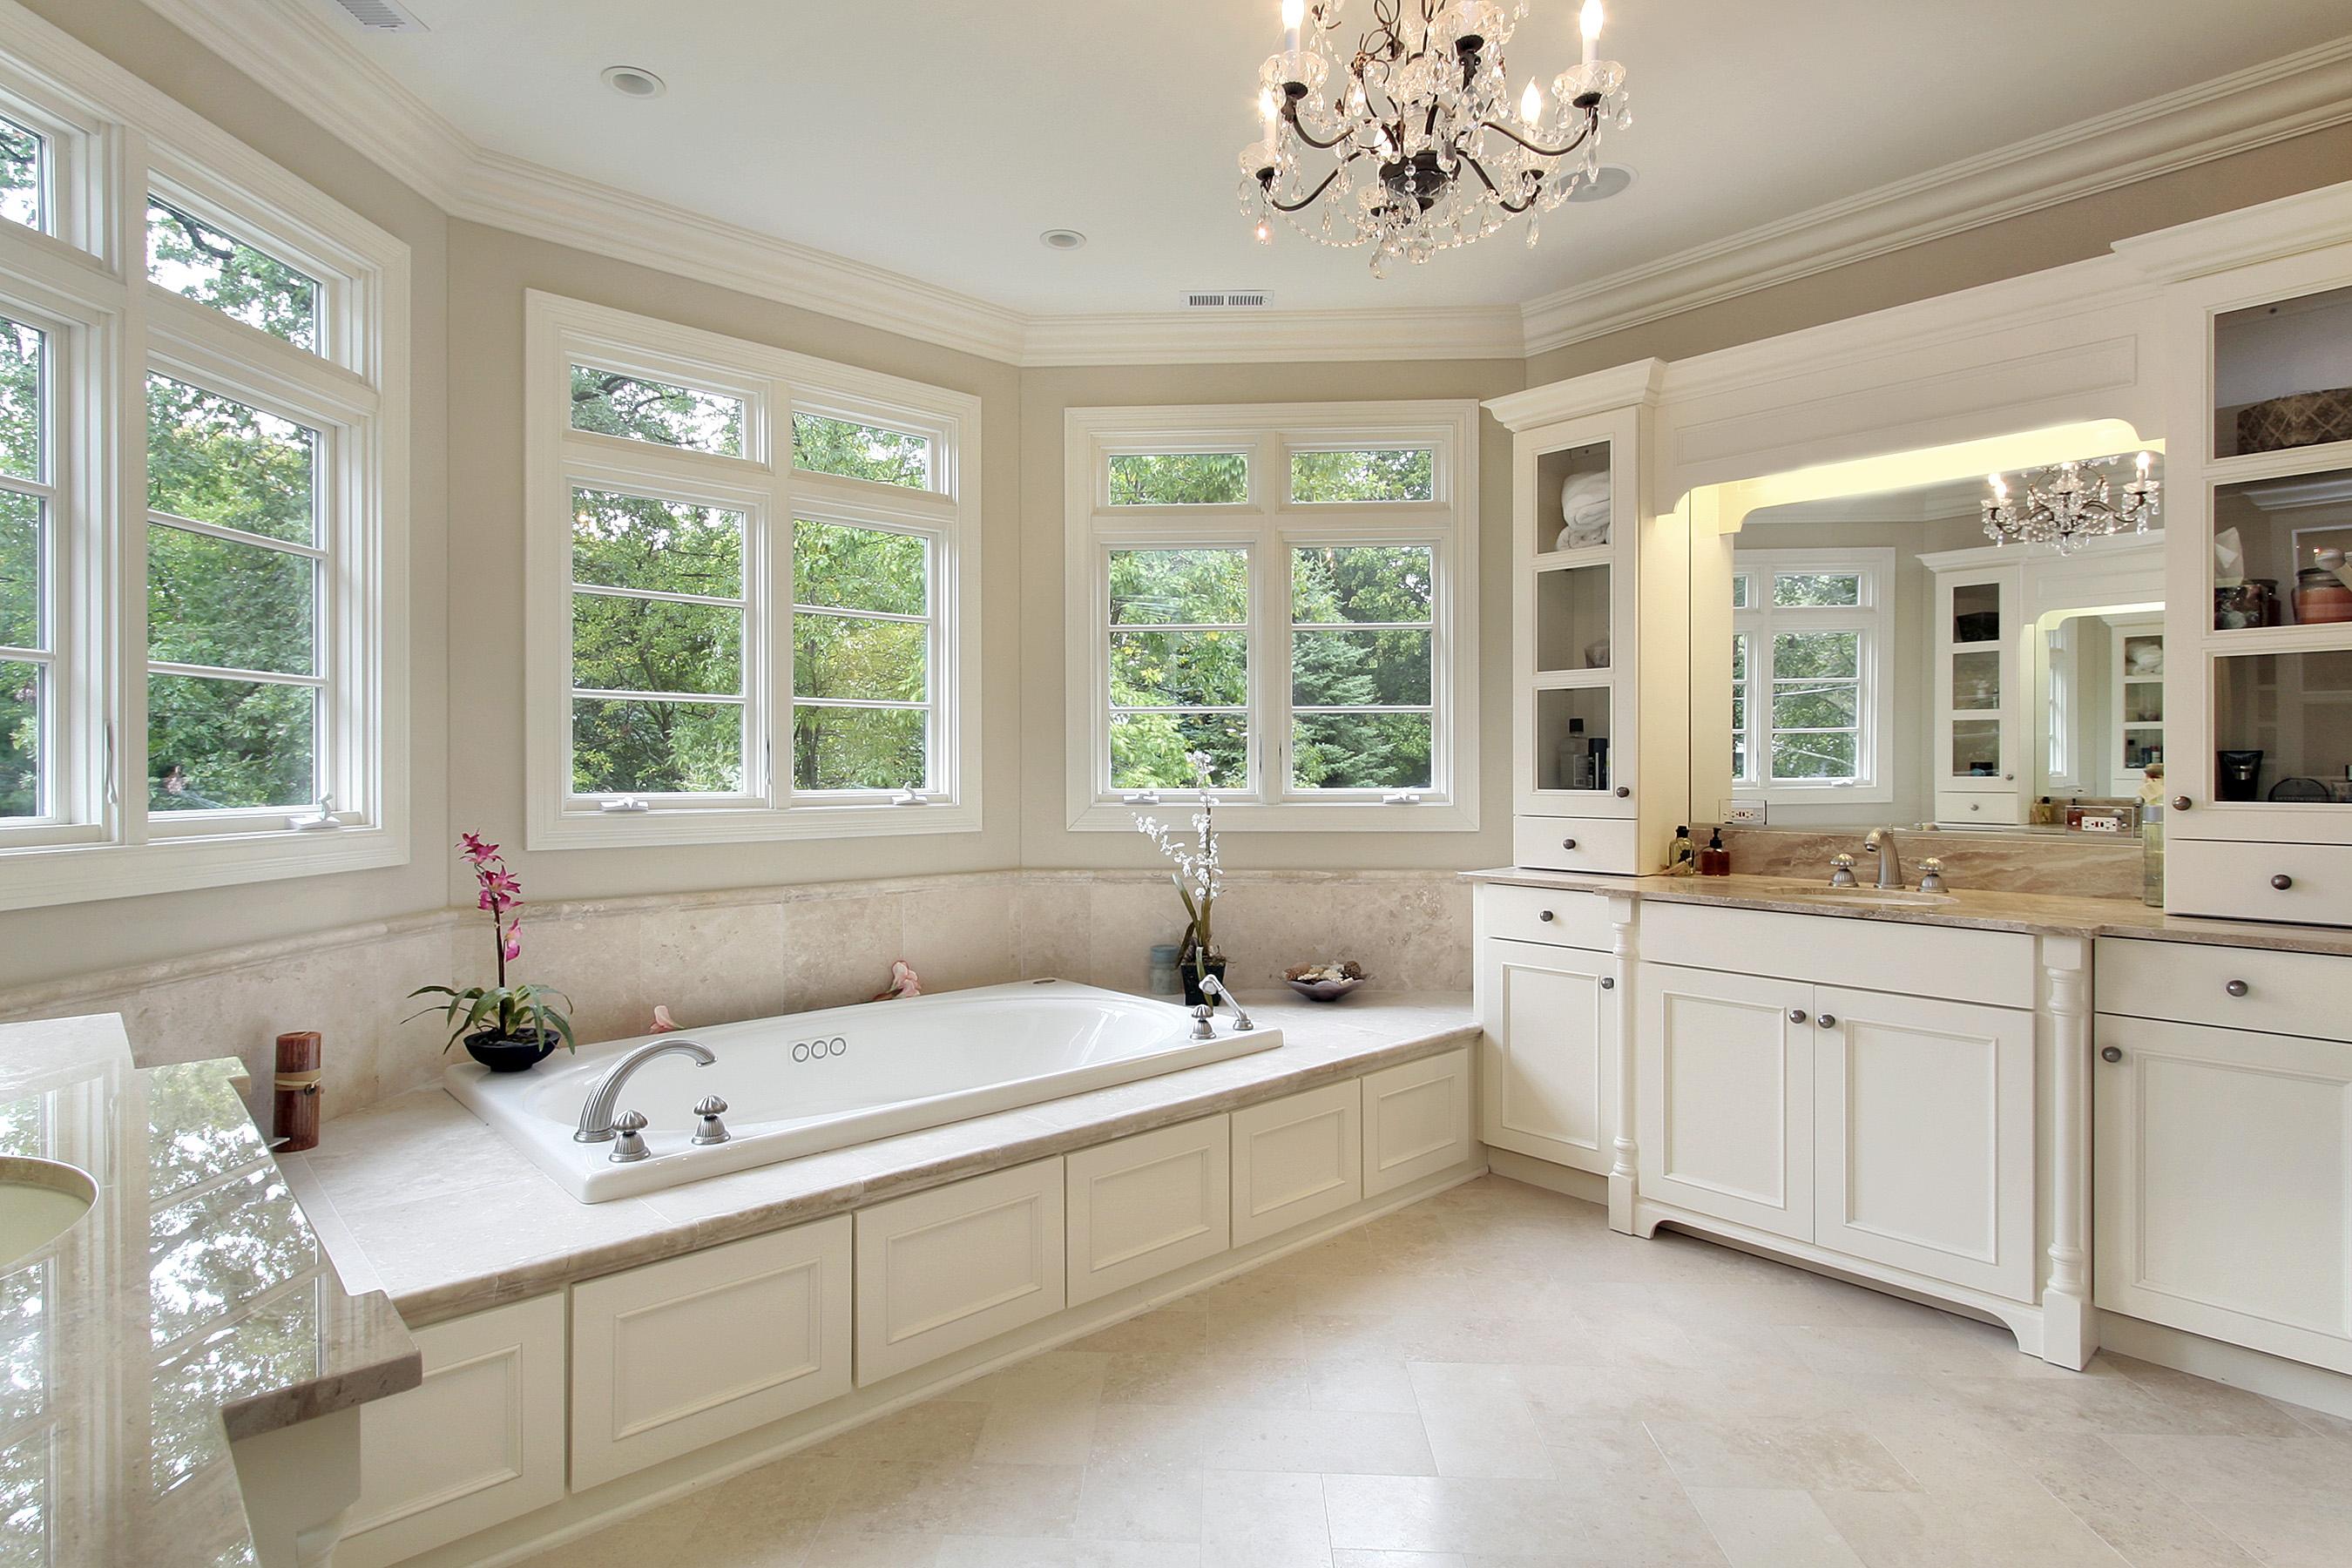 bigstock-Master-Bath-In-Luxury-Home-5147919